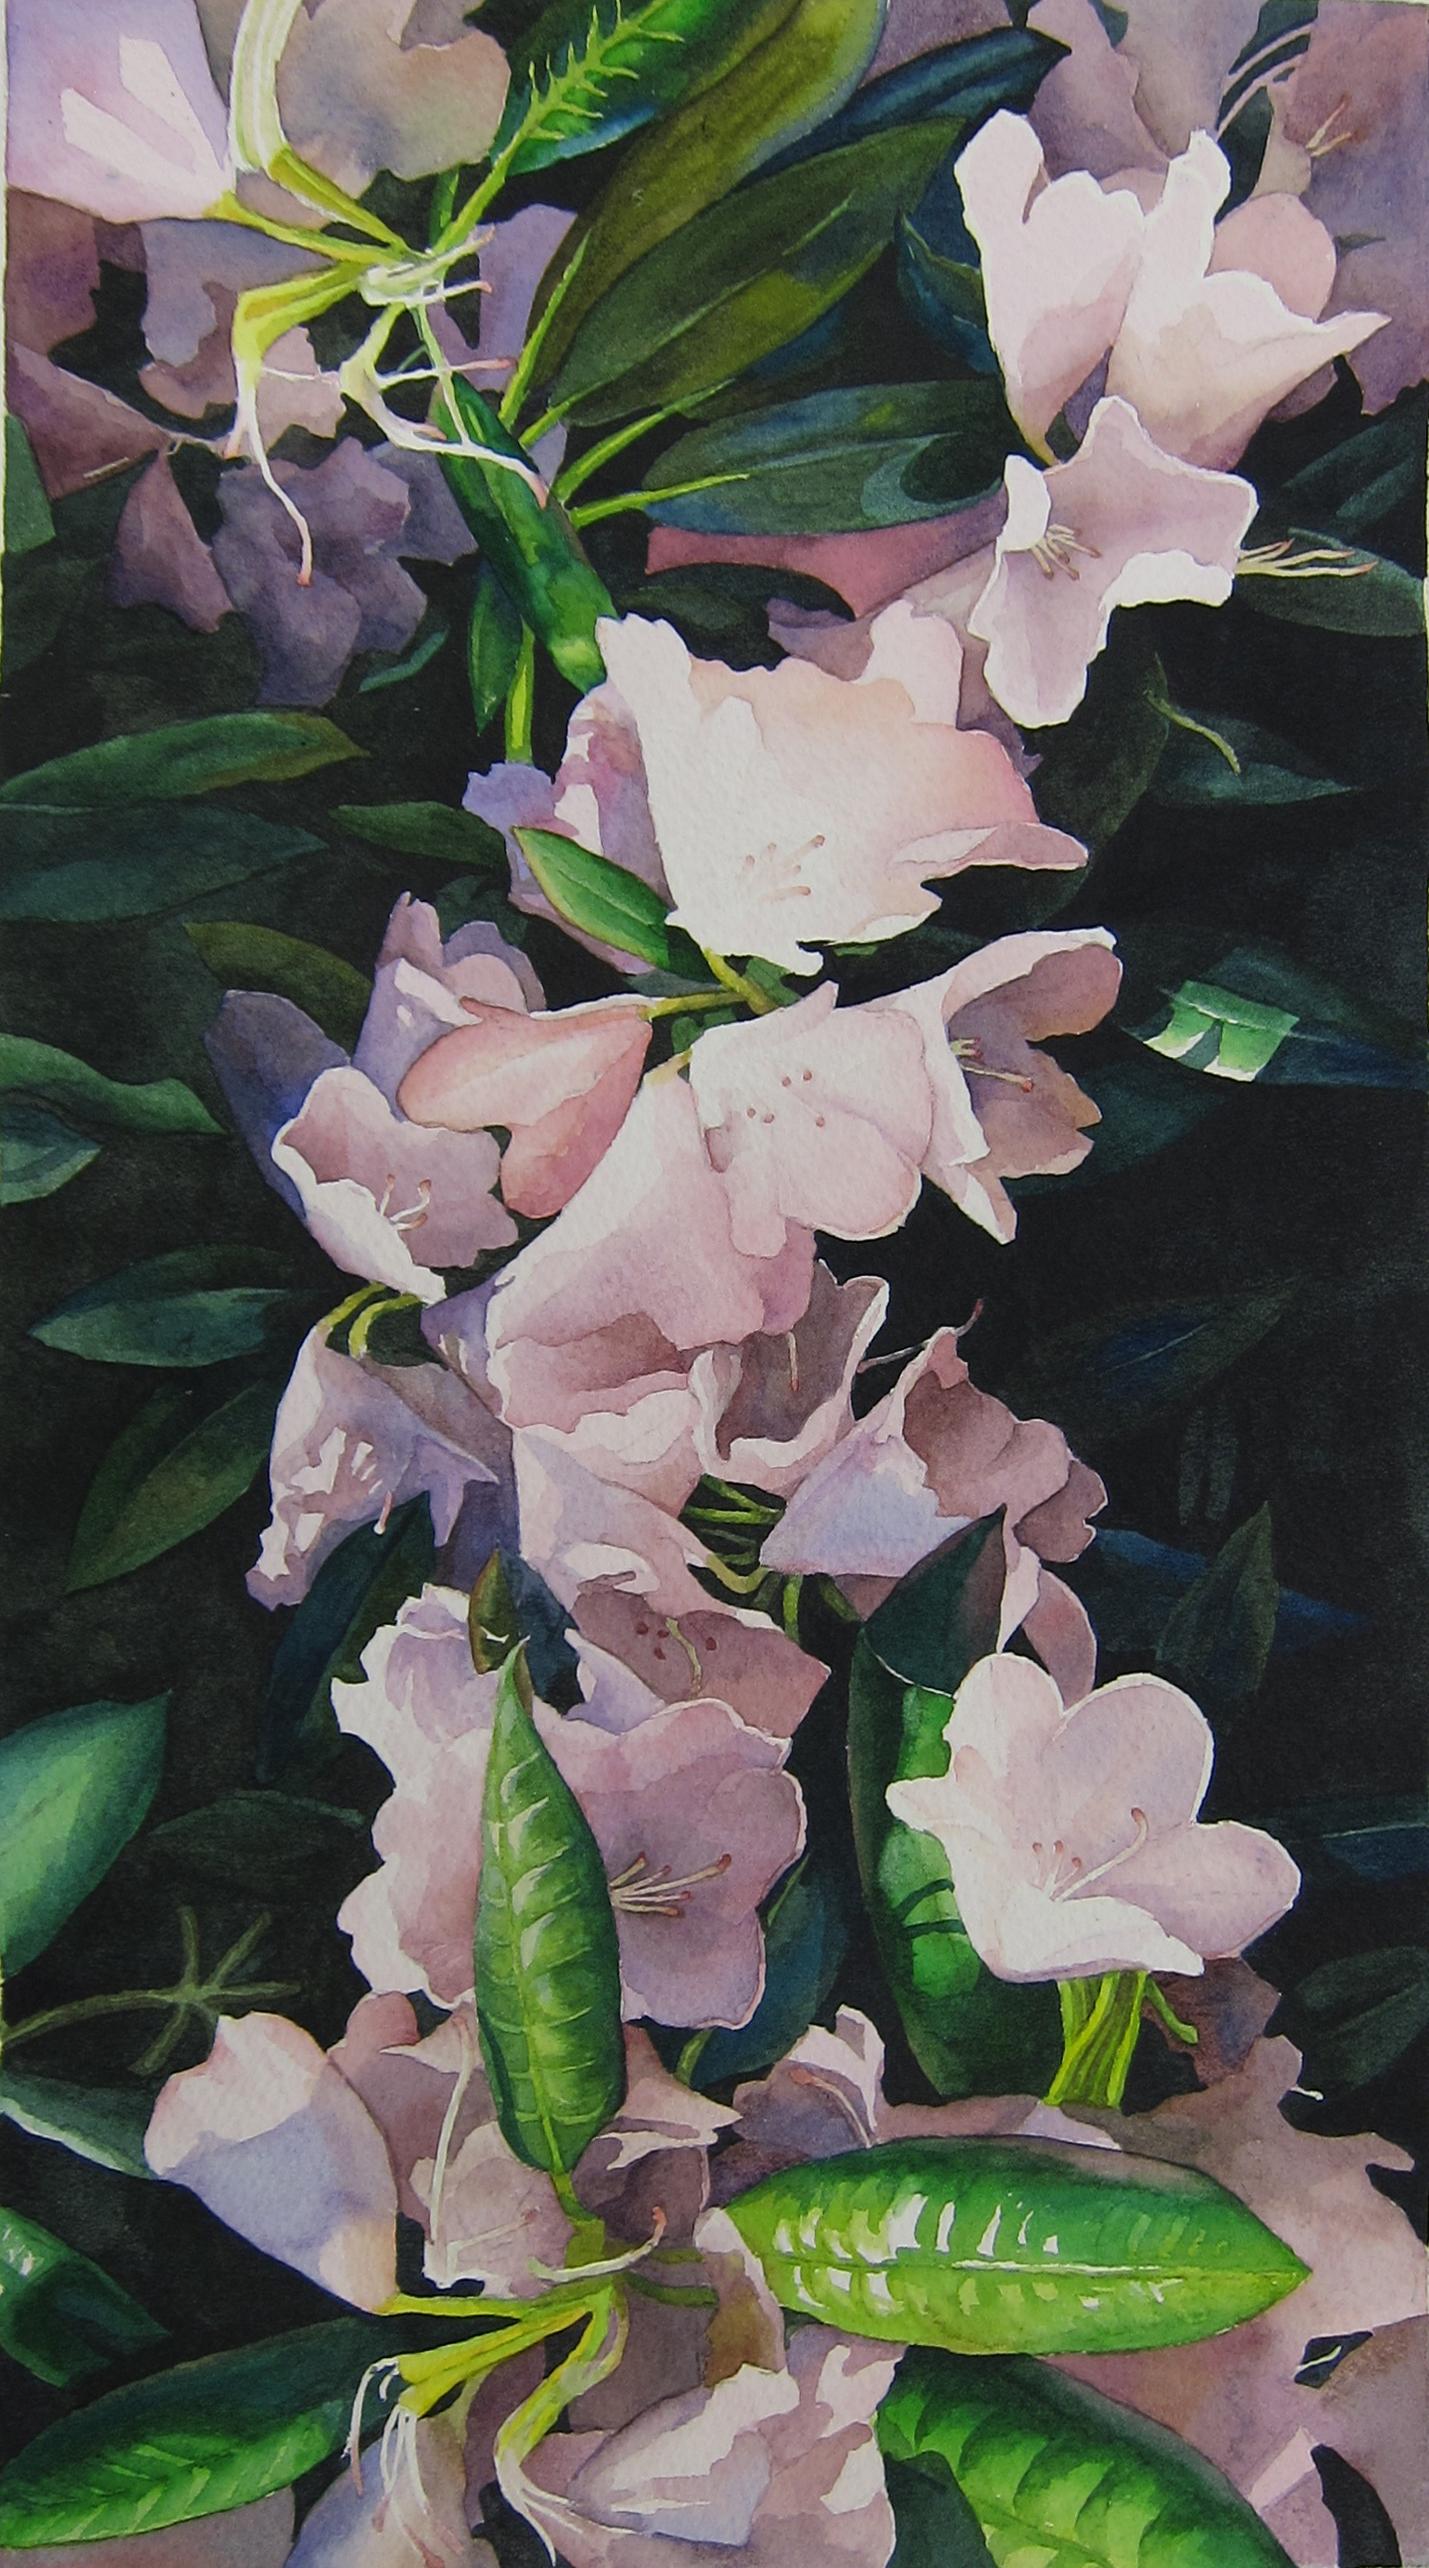 (Sold) The Garden 2017